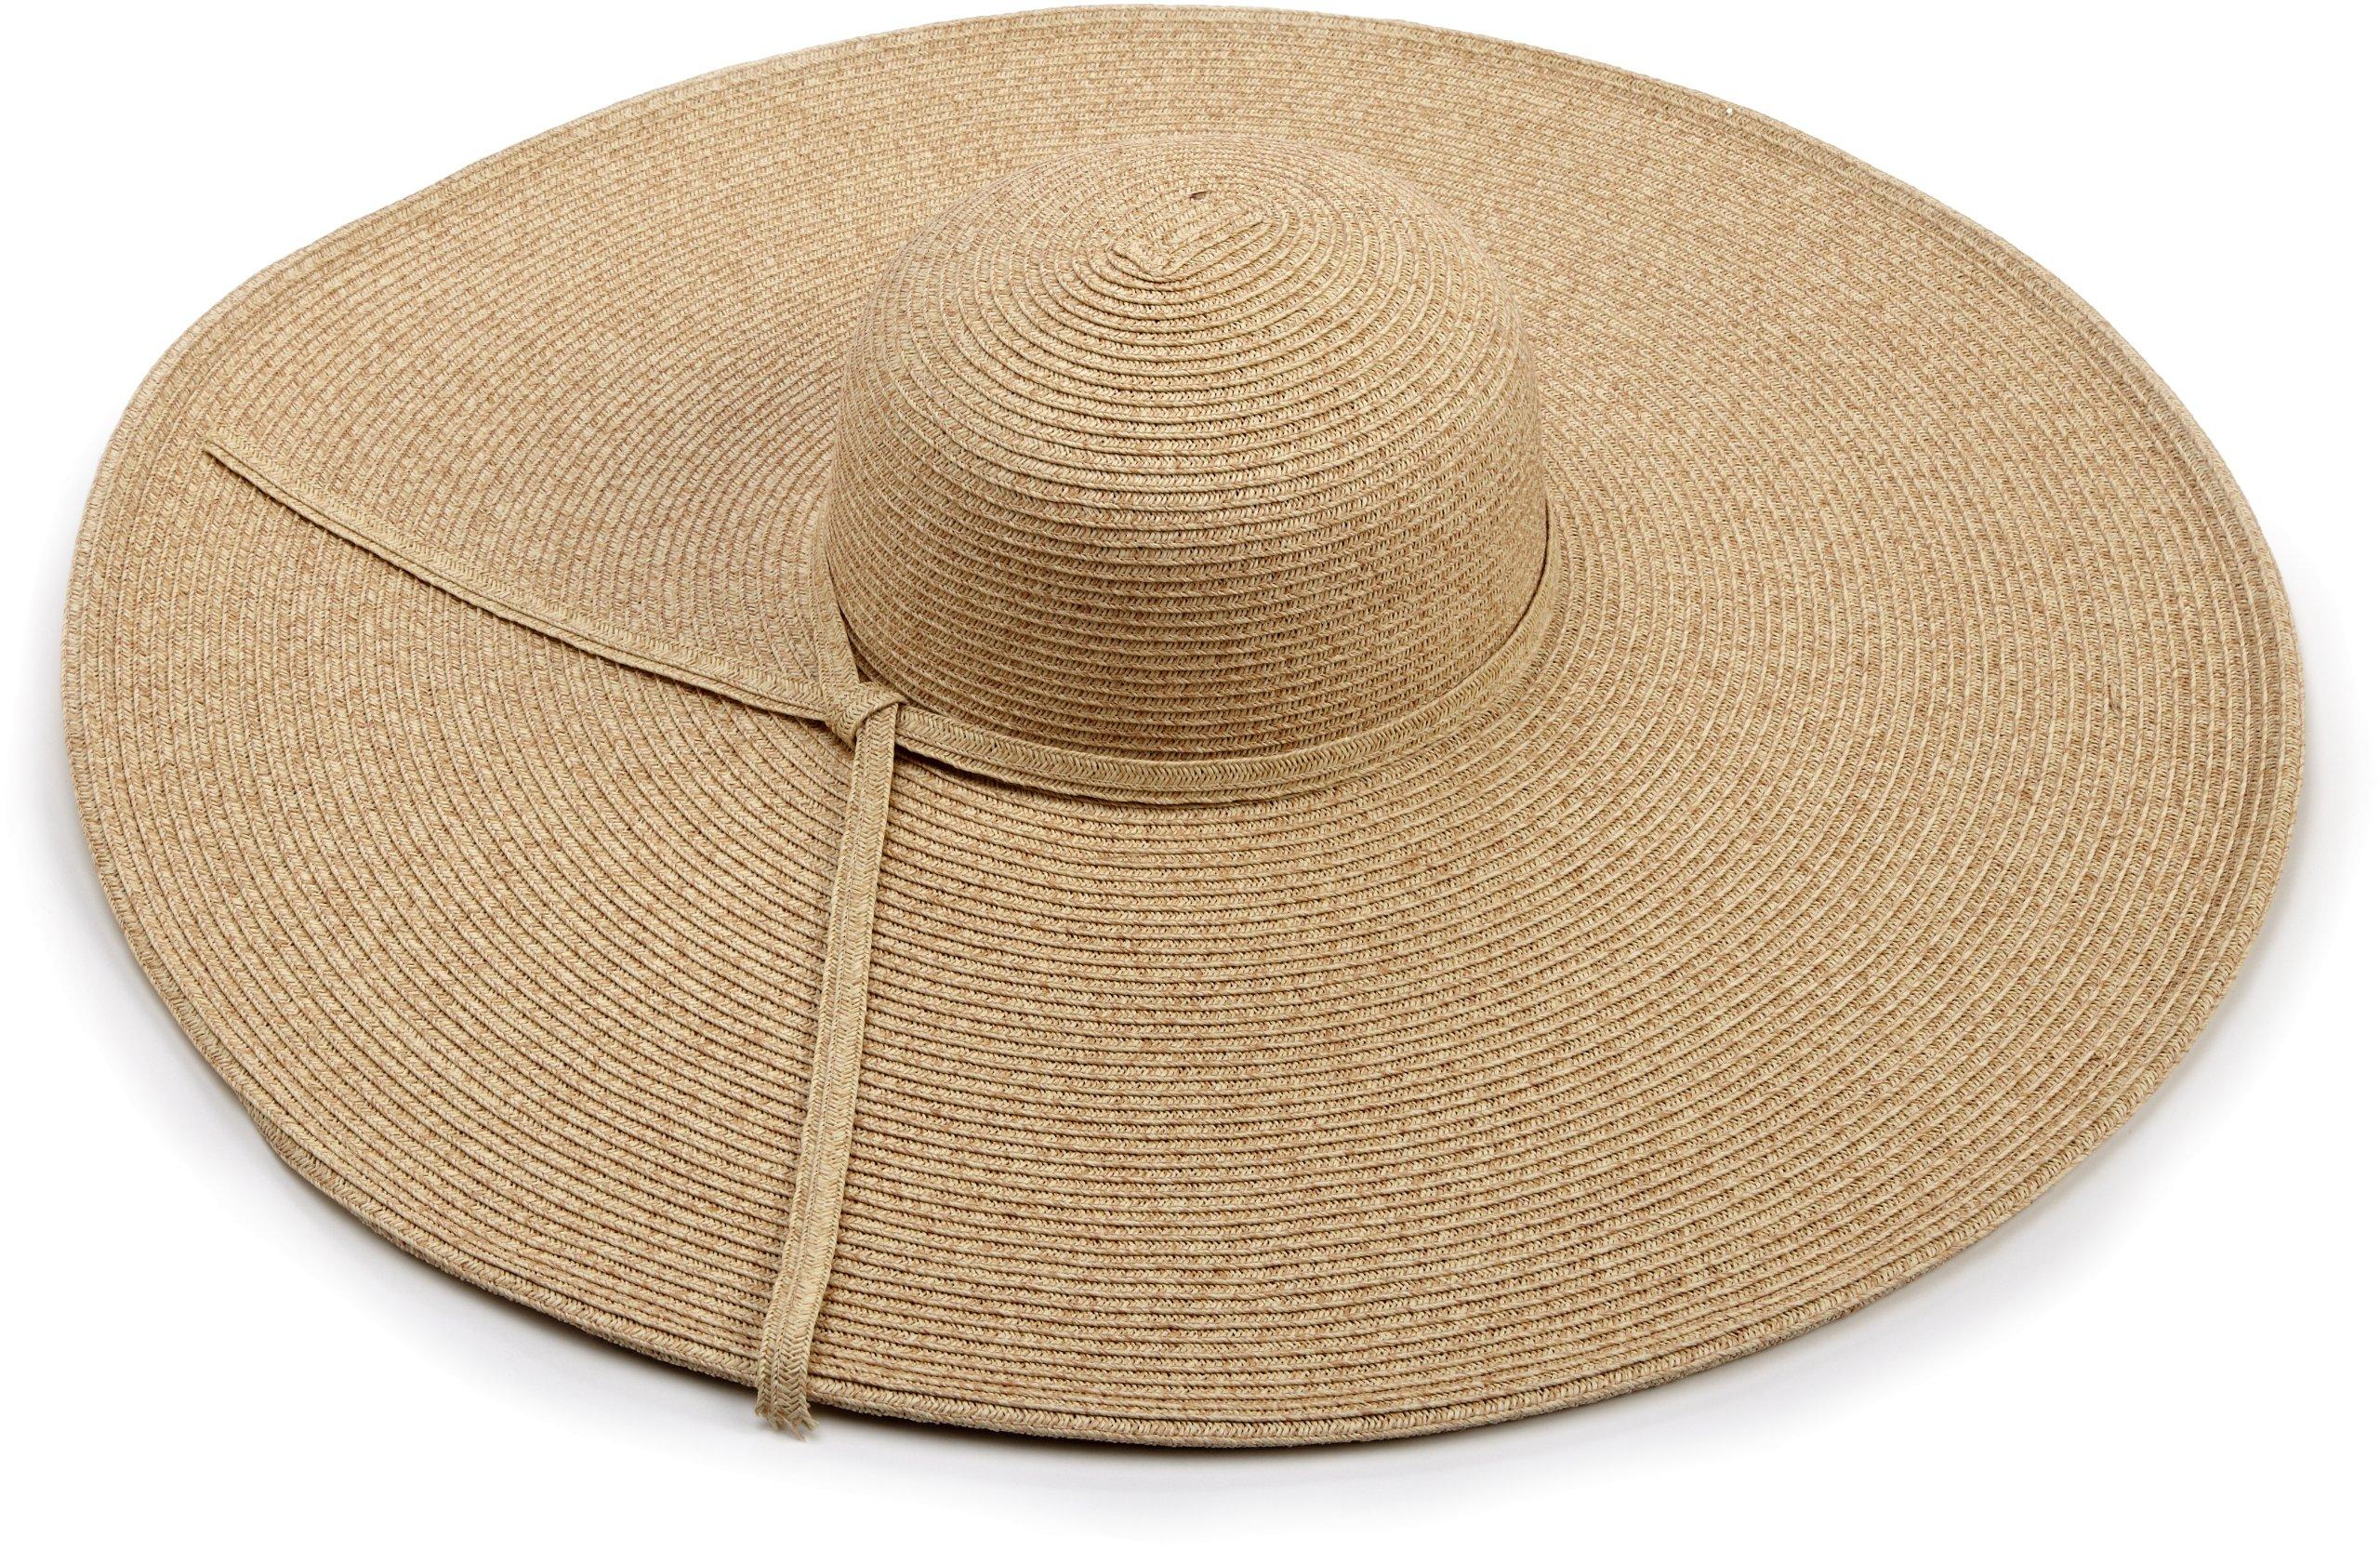 San Diego Hat Company Women's Ultrabraid X Large Brim Hat,Toast,One Size by San Diego Hat Company (Image #2)